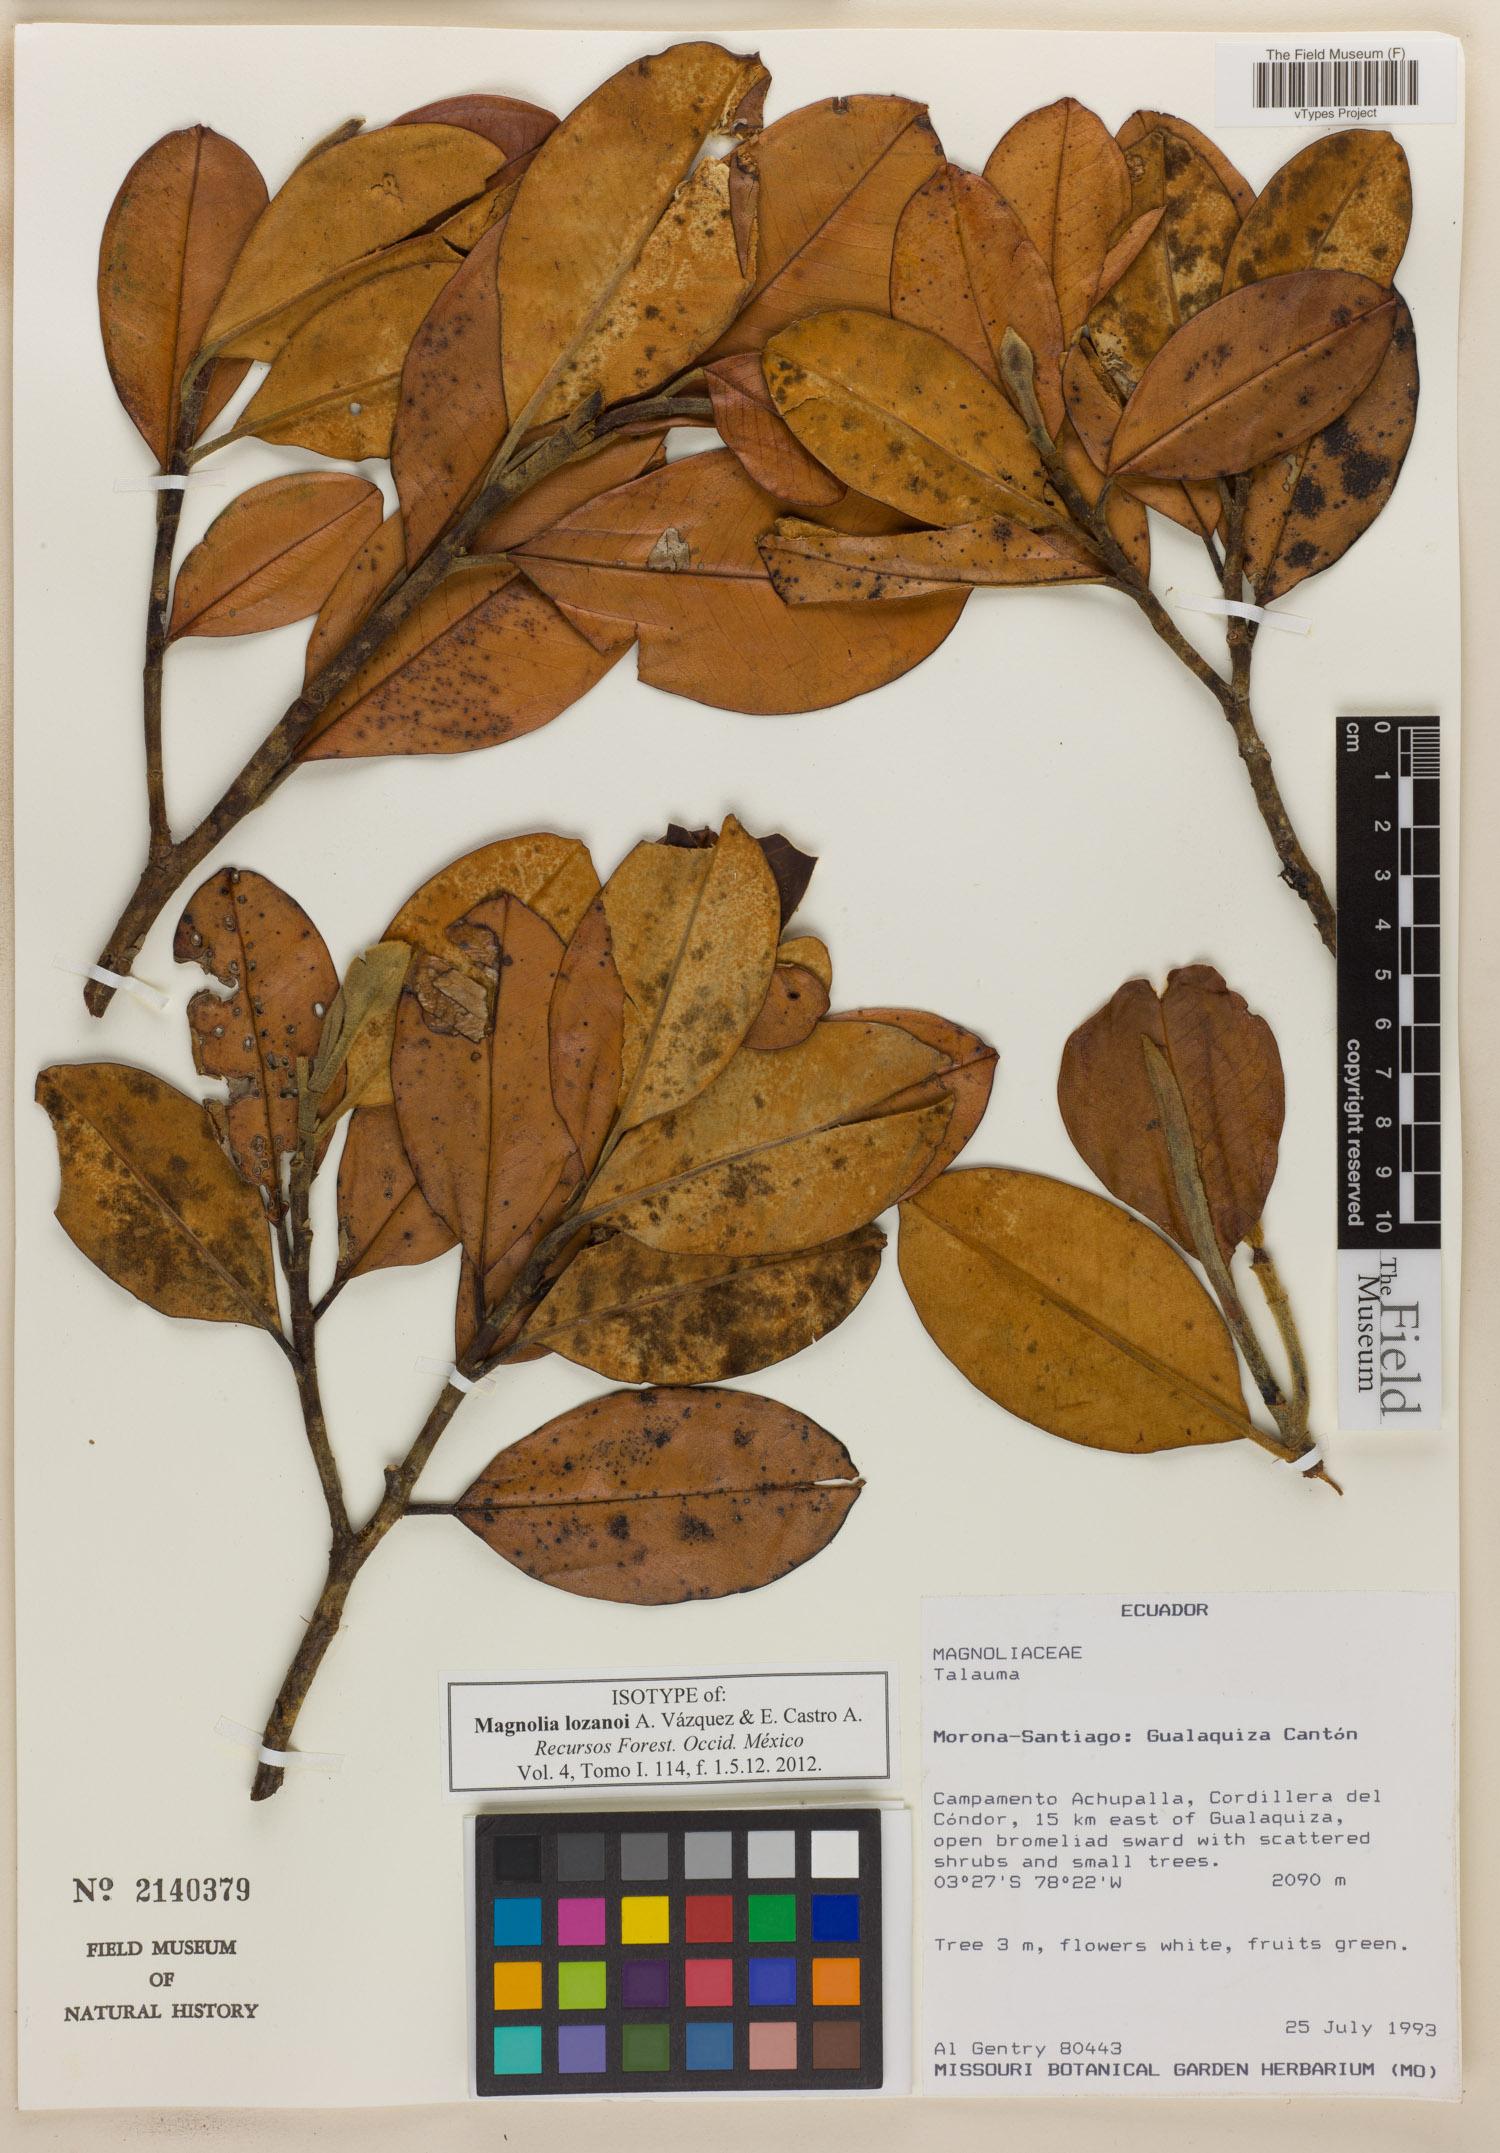 Specimen: Magnolia lozanoi